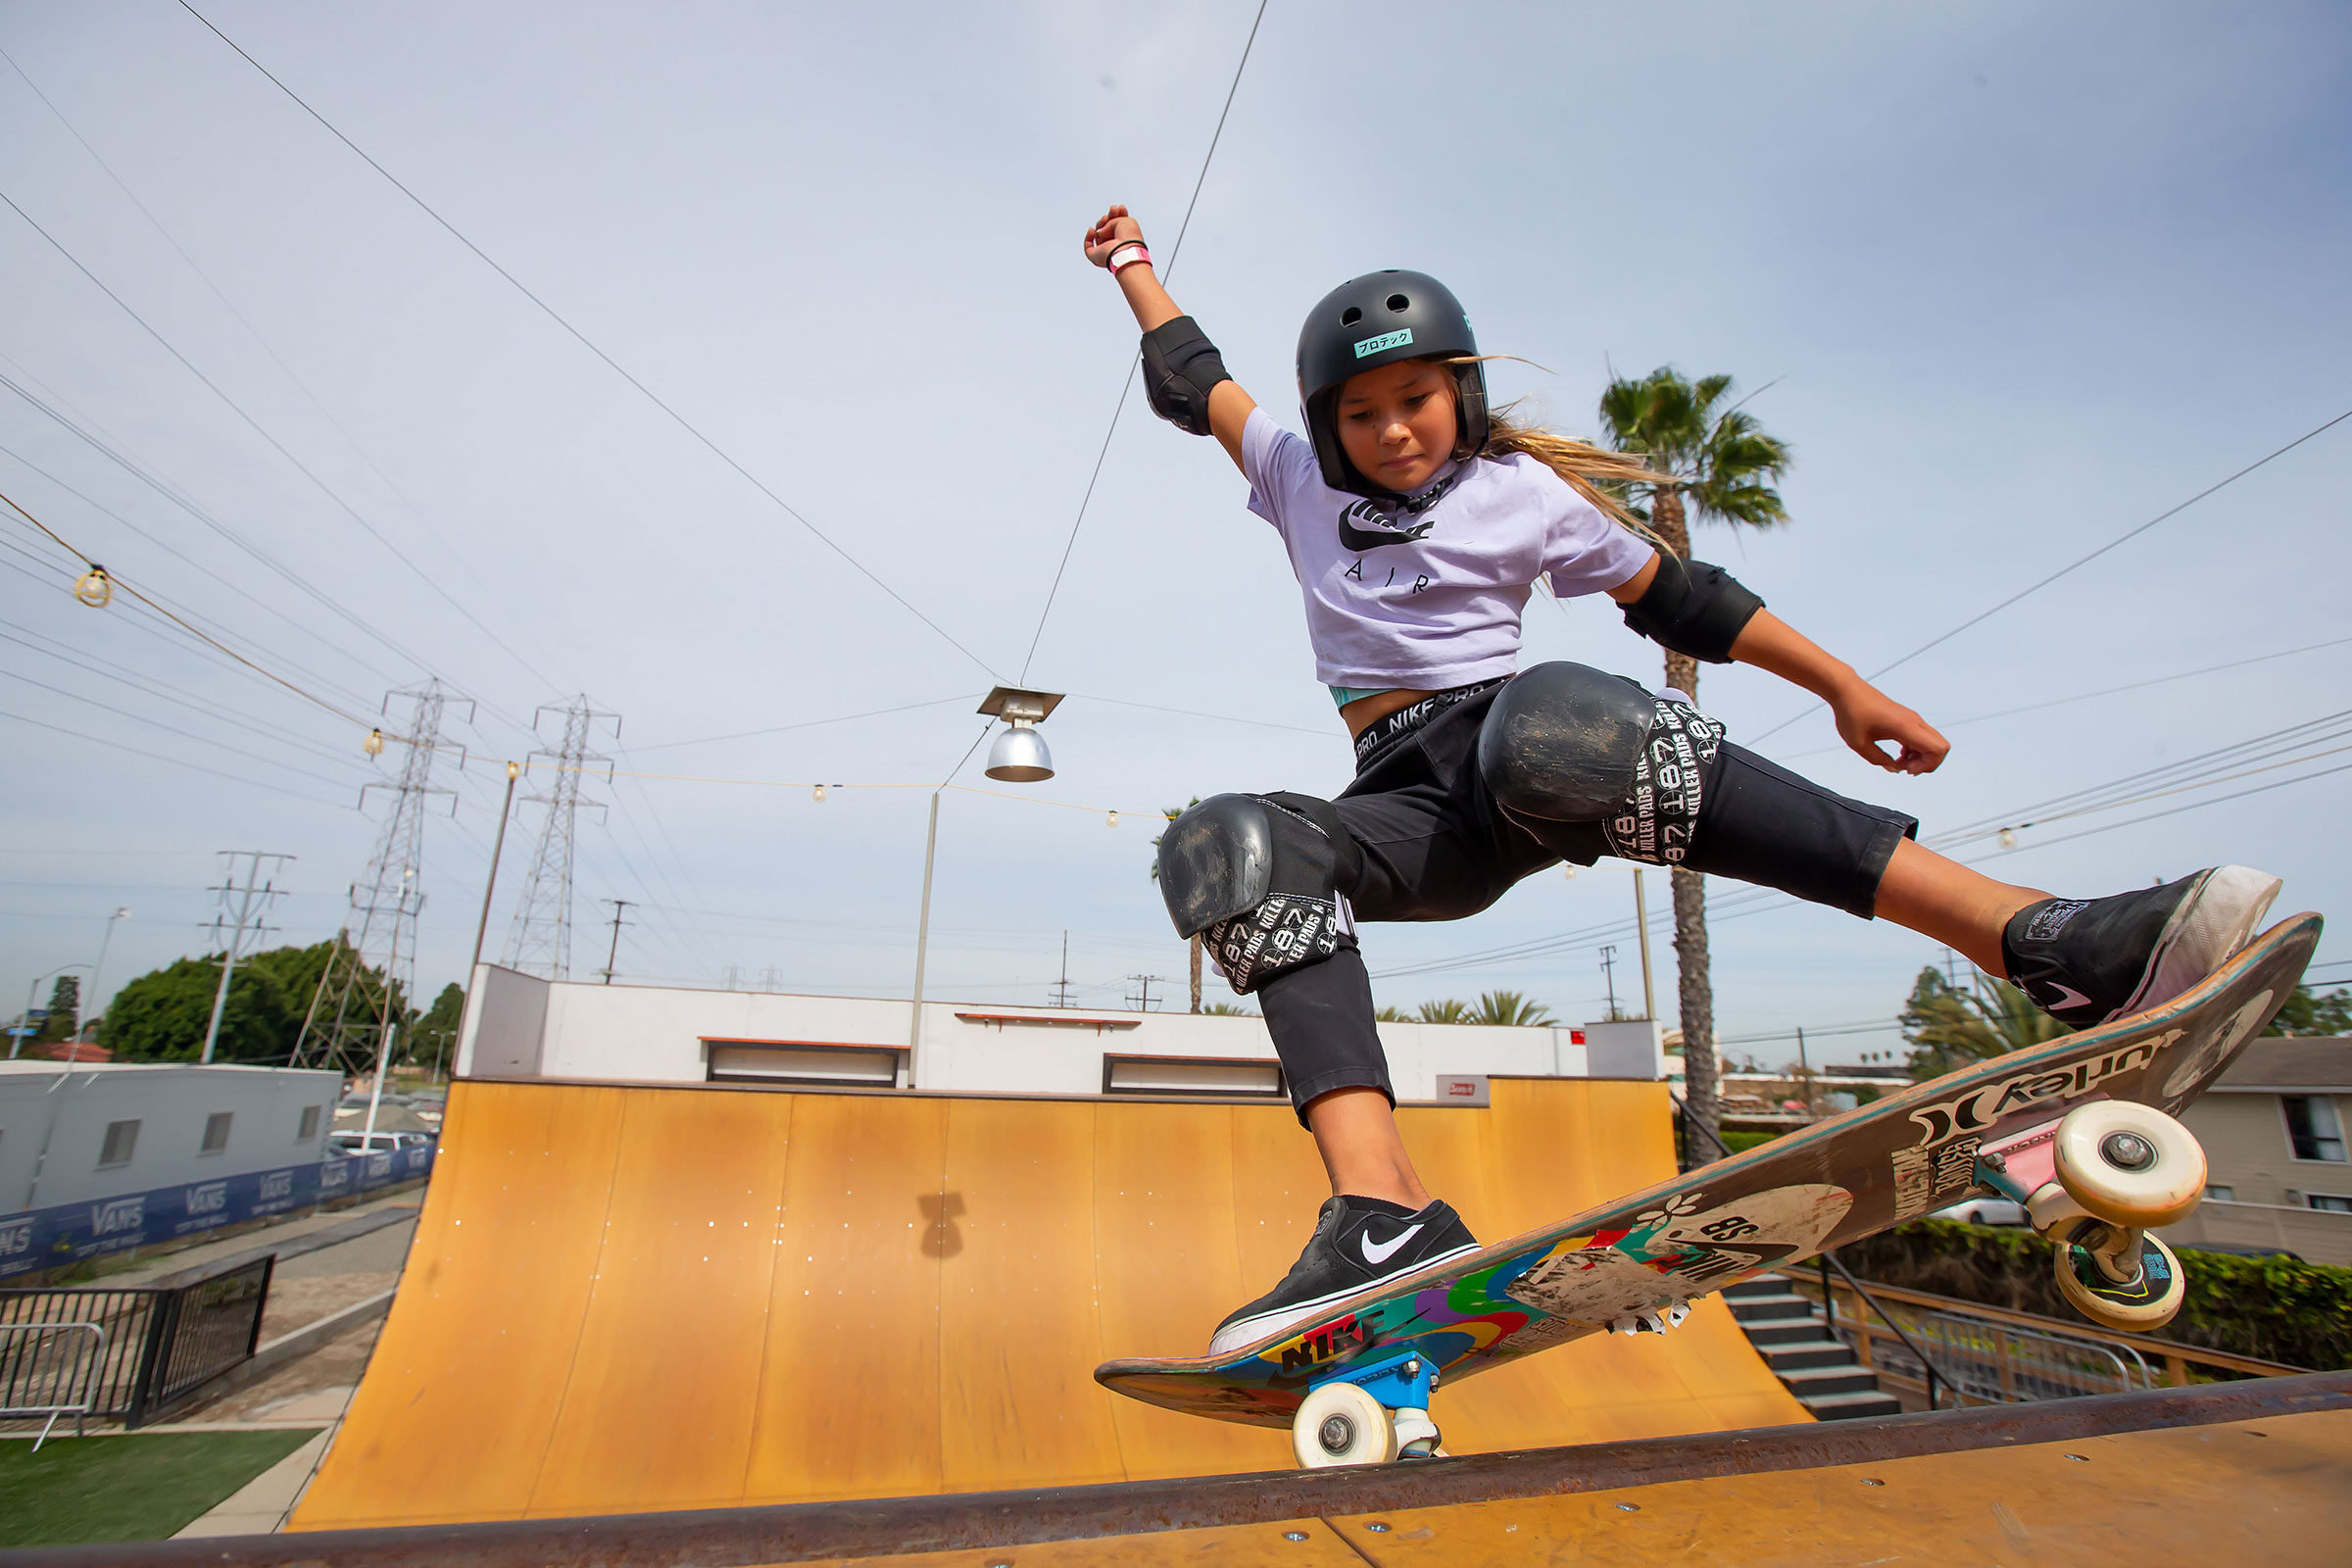 Sky Brown at Vans Off The Wall Huntington Beach skatepark in 2020 in Los Angeles, California.